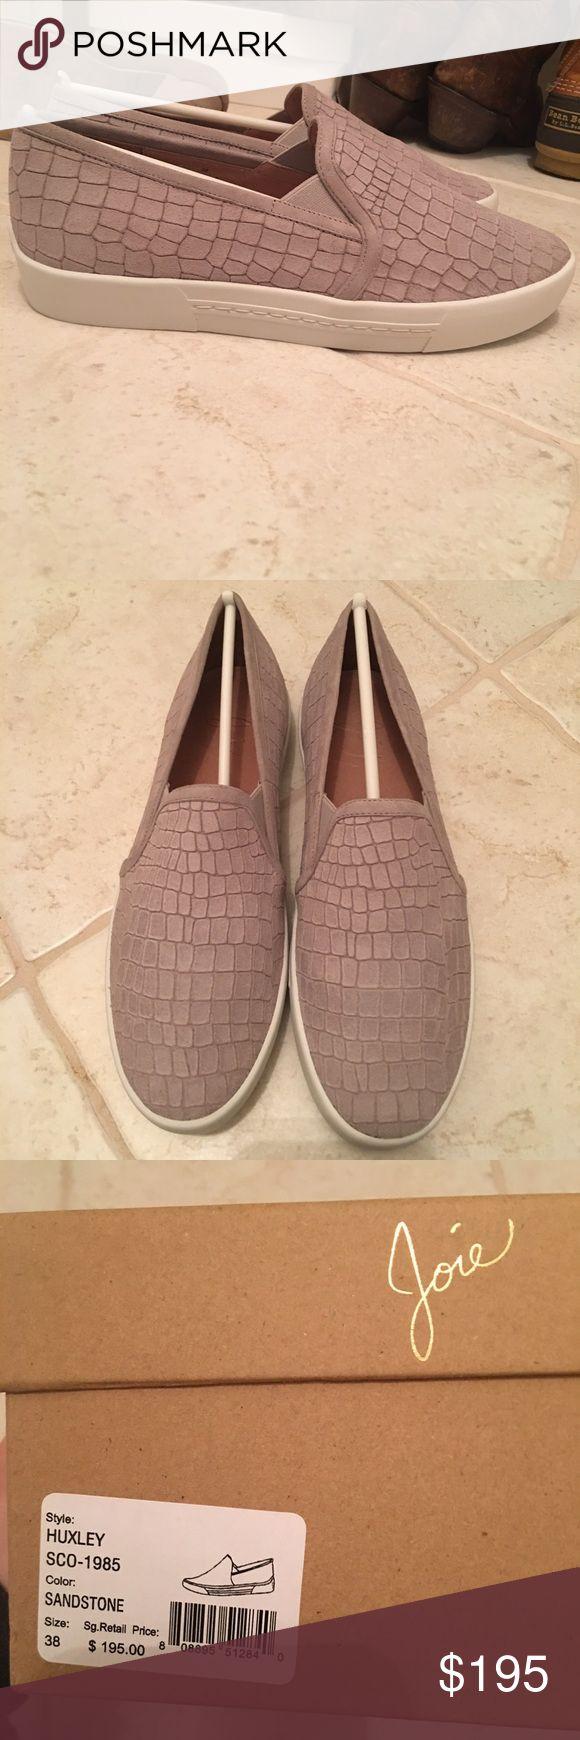 Joie Huxley Sandstone Sneakers Sandstone, size 38, never worn Joie Shoes